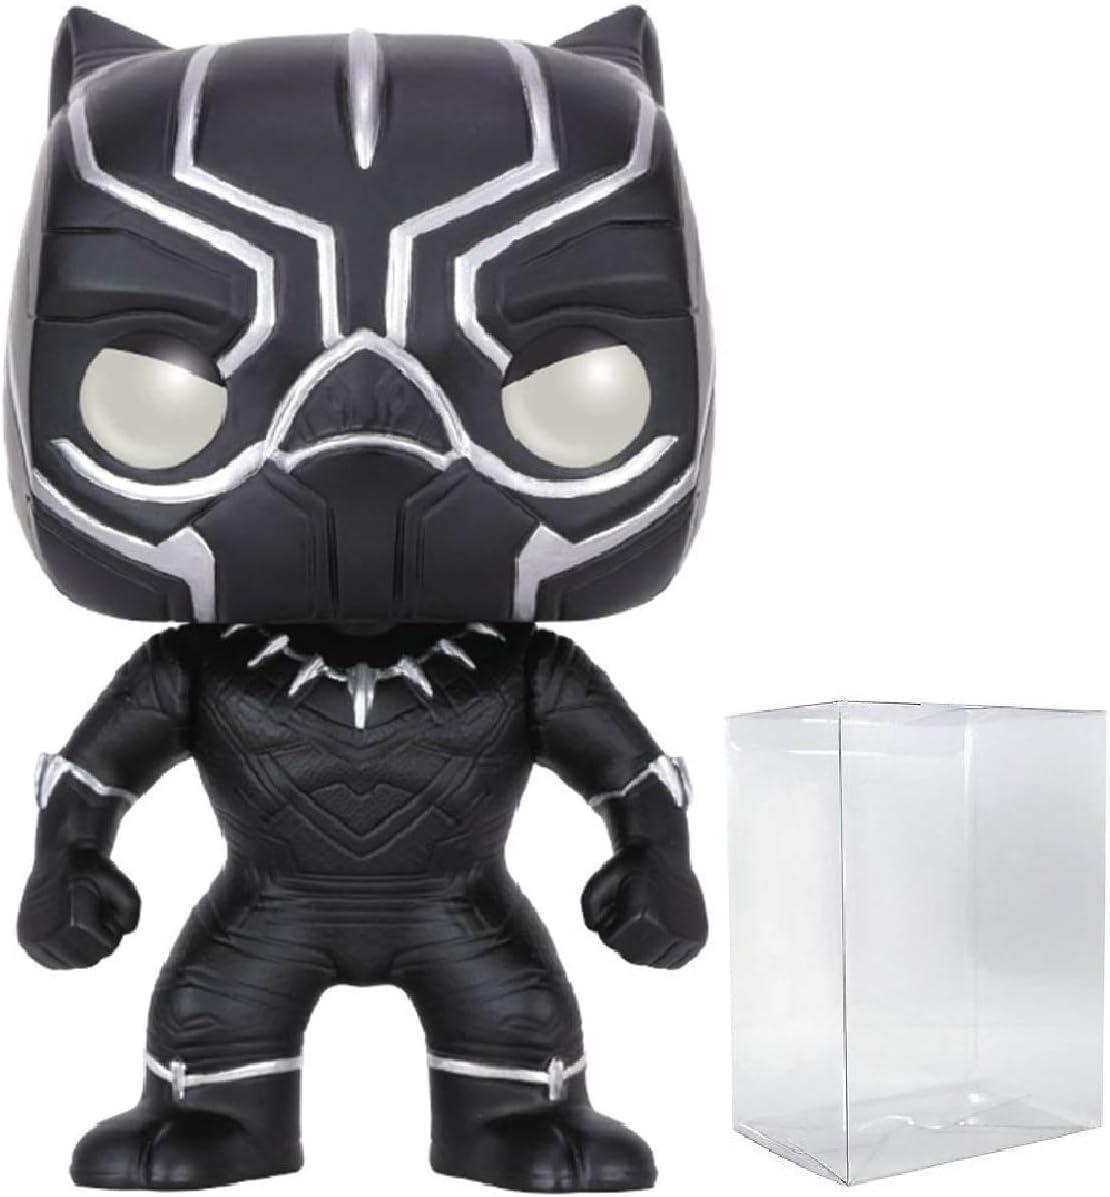 Marvel Civil War Captain America//Black Panther Unmasked Nr.138 Exclus Funko Pop